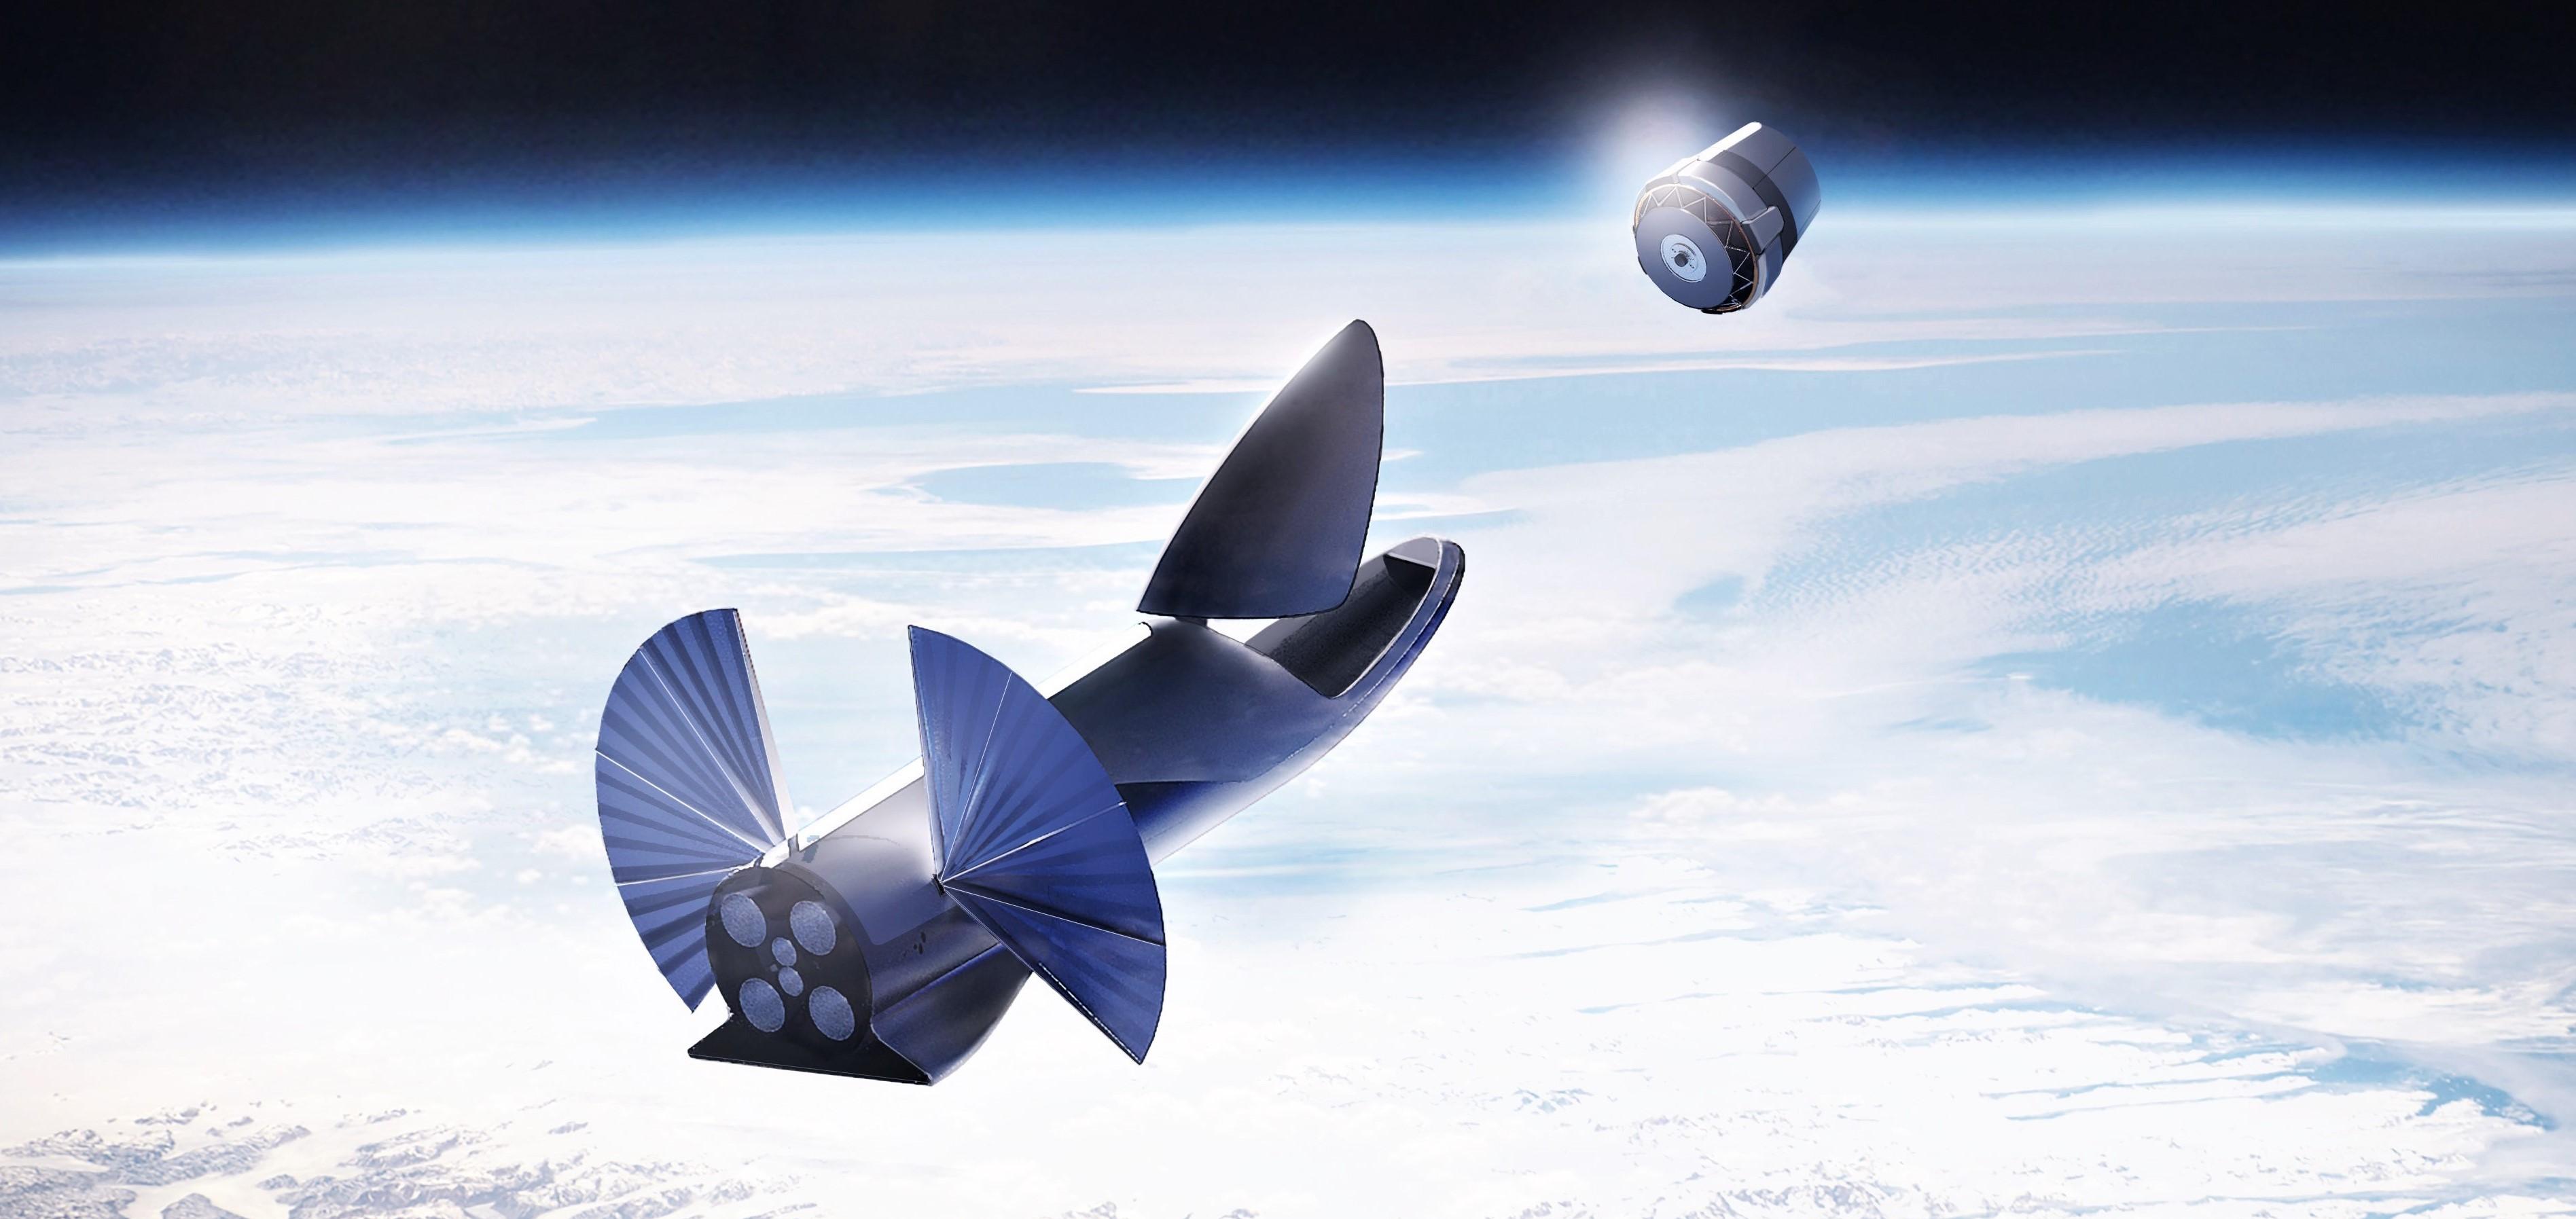 BFS chomper payload bay cargo (SpaceX) 2017 1 crop